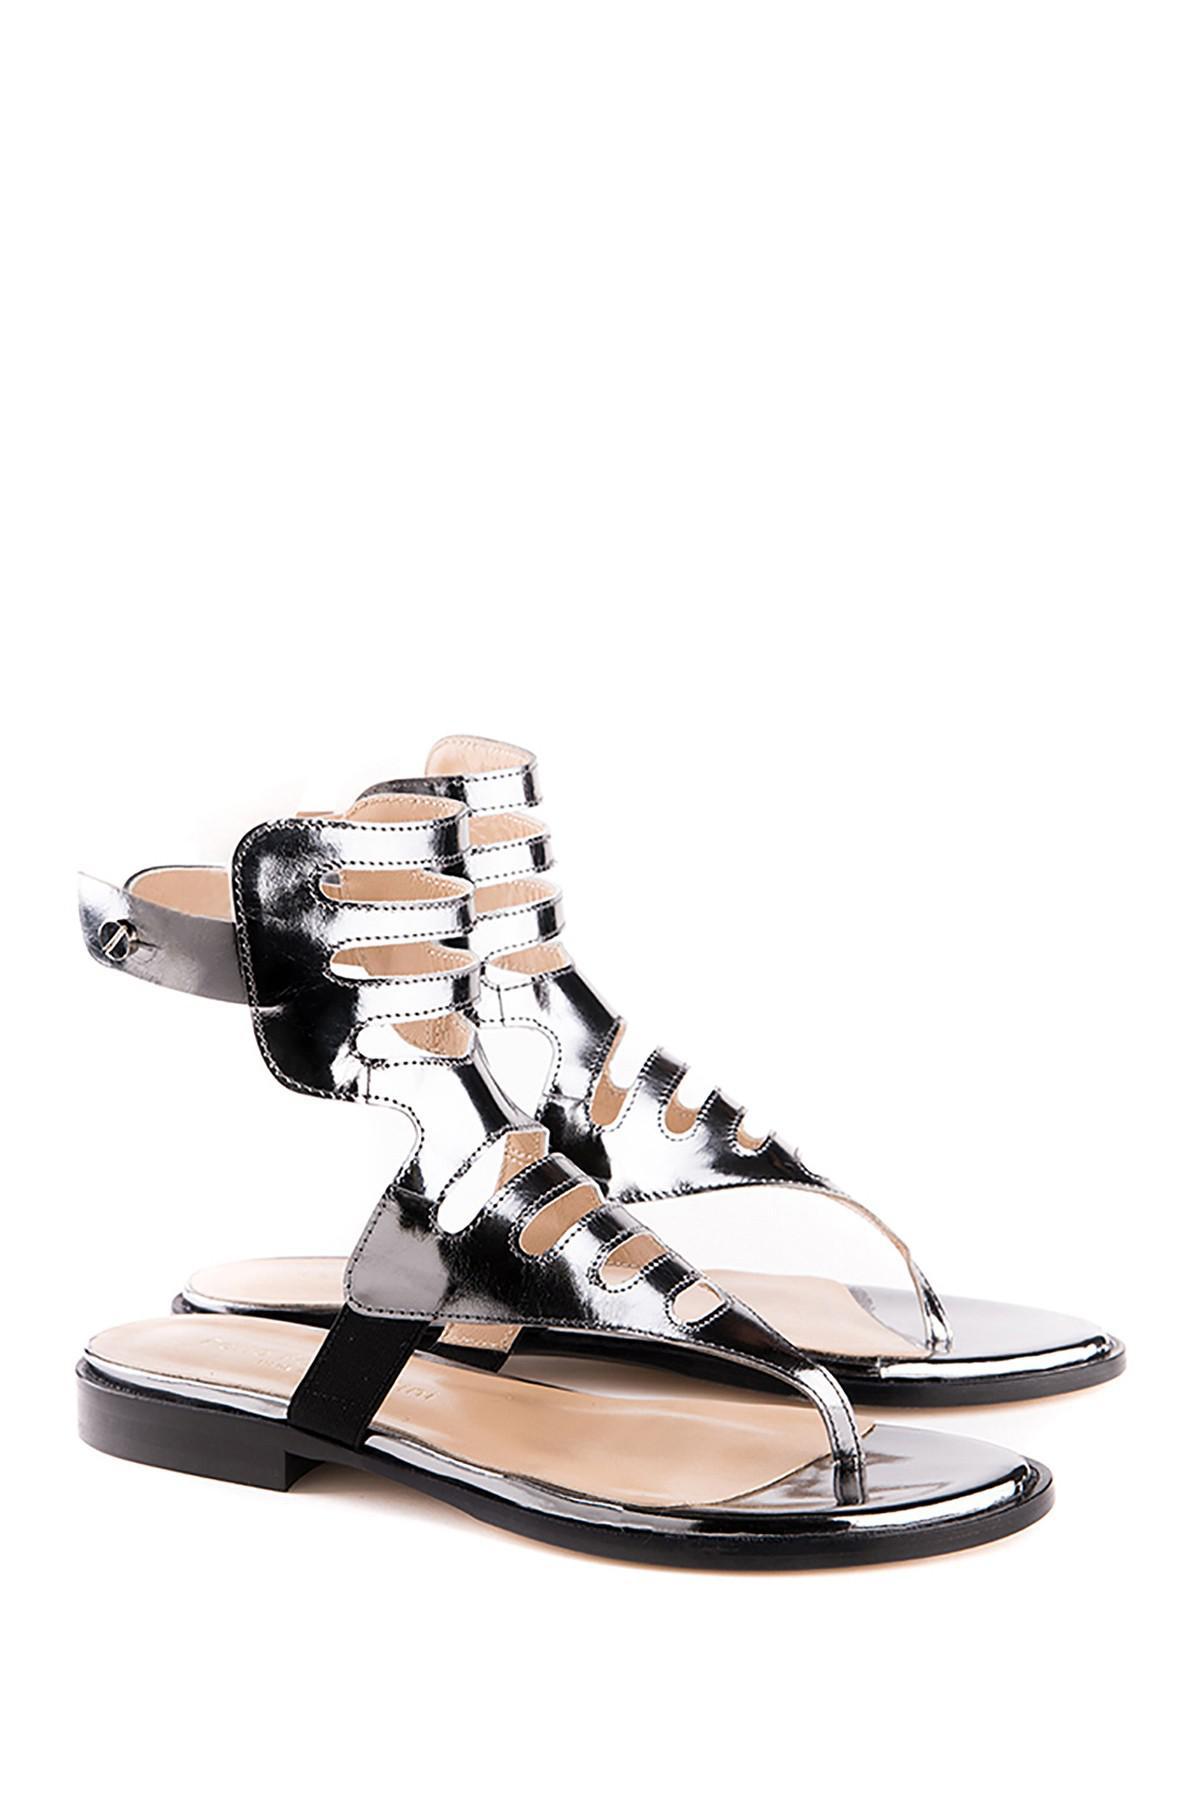 Perla Formentini Amedea Leather Sandal qbXO8NnWoj